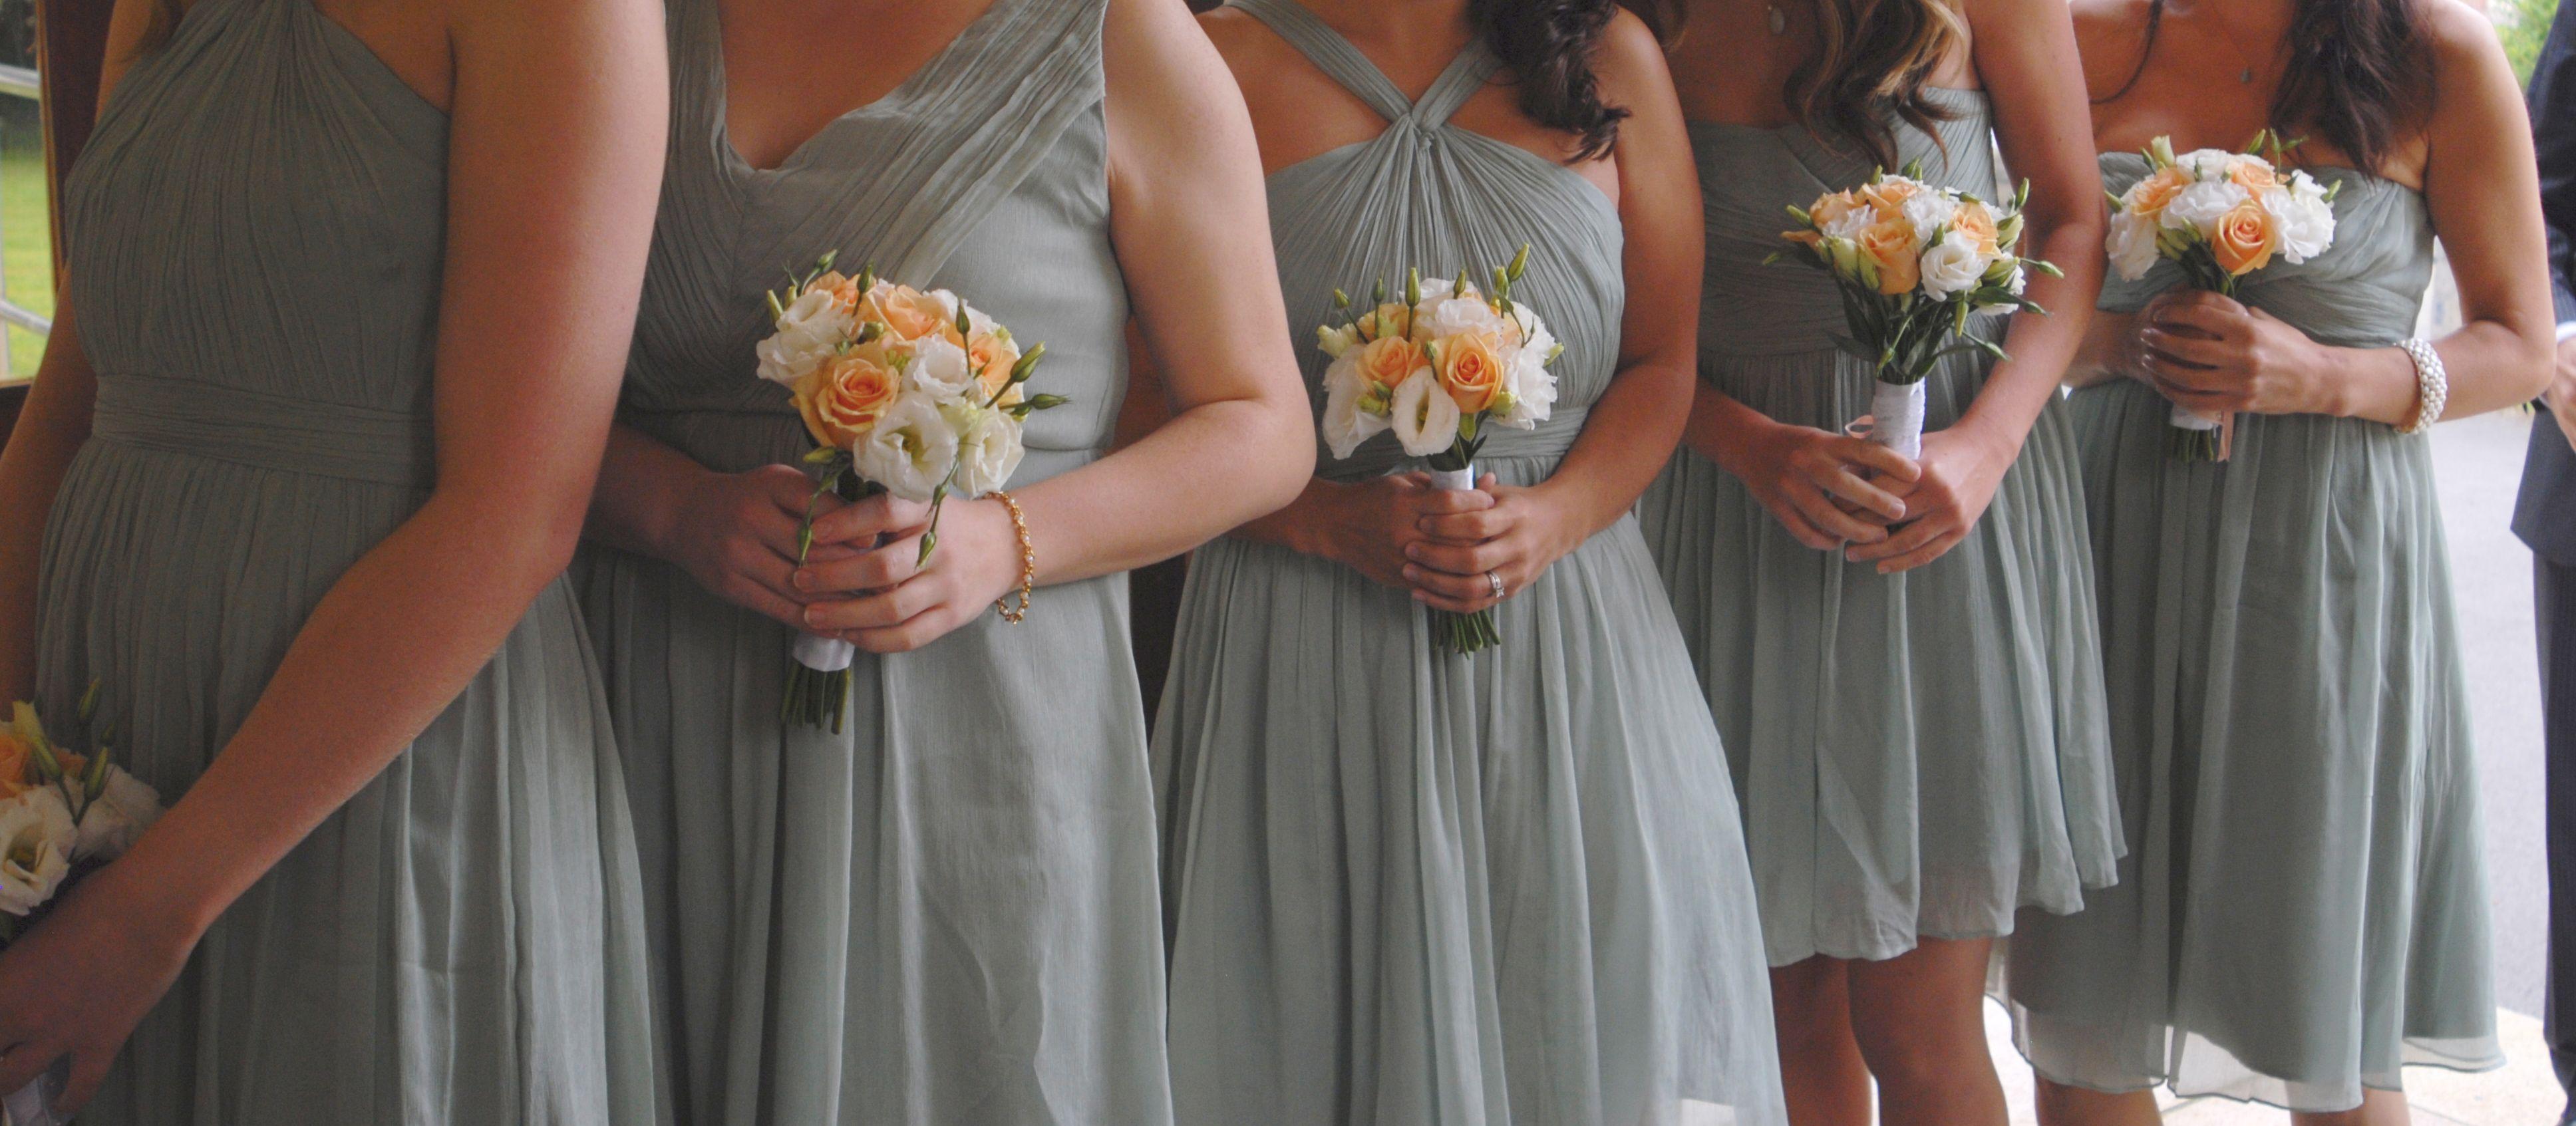 Bridesmaids dresses from jcrew jessica tate weddings bridesmaids dresses from jcrew jessica tate ombrellifo Gallery